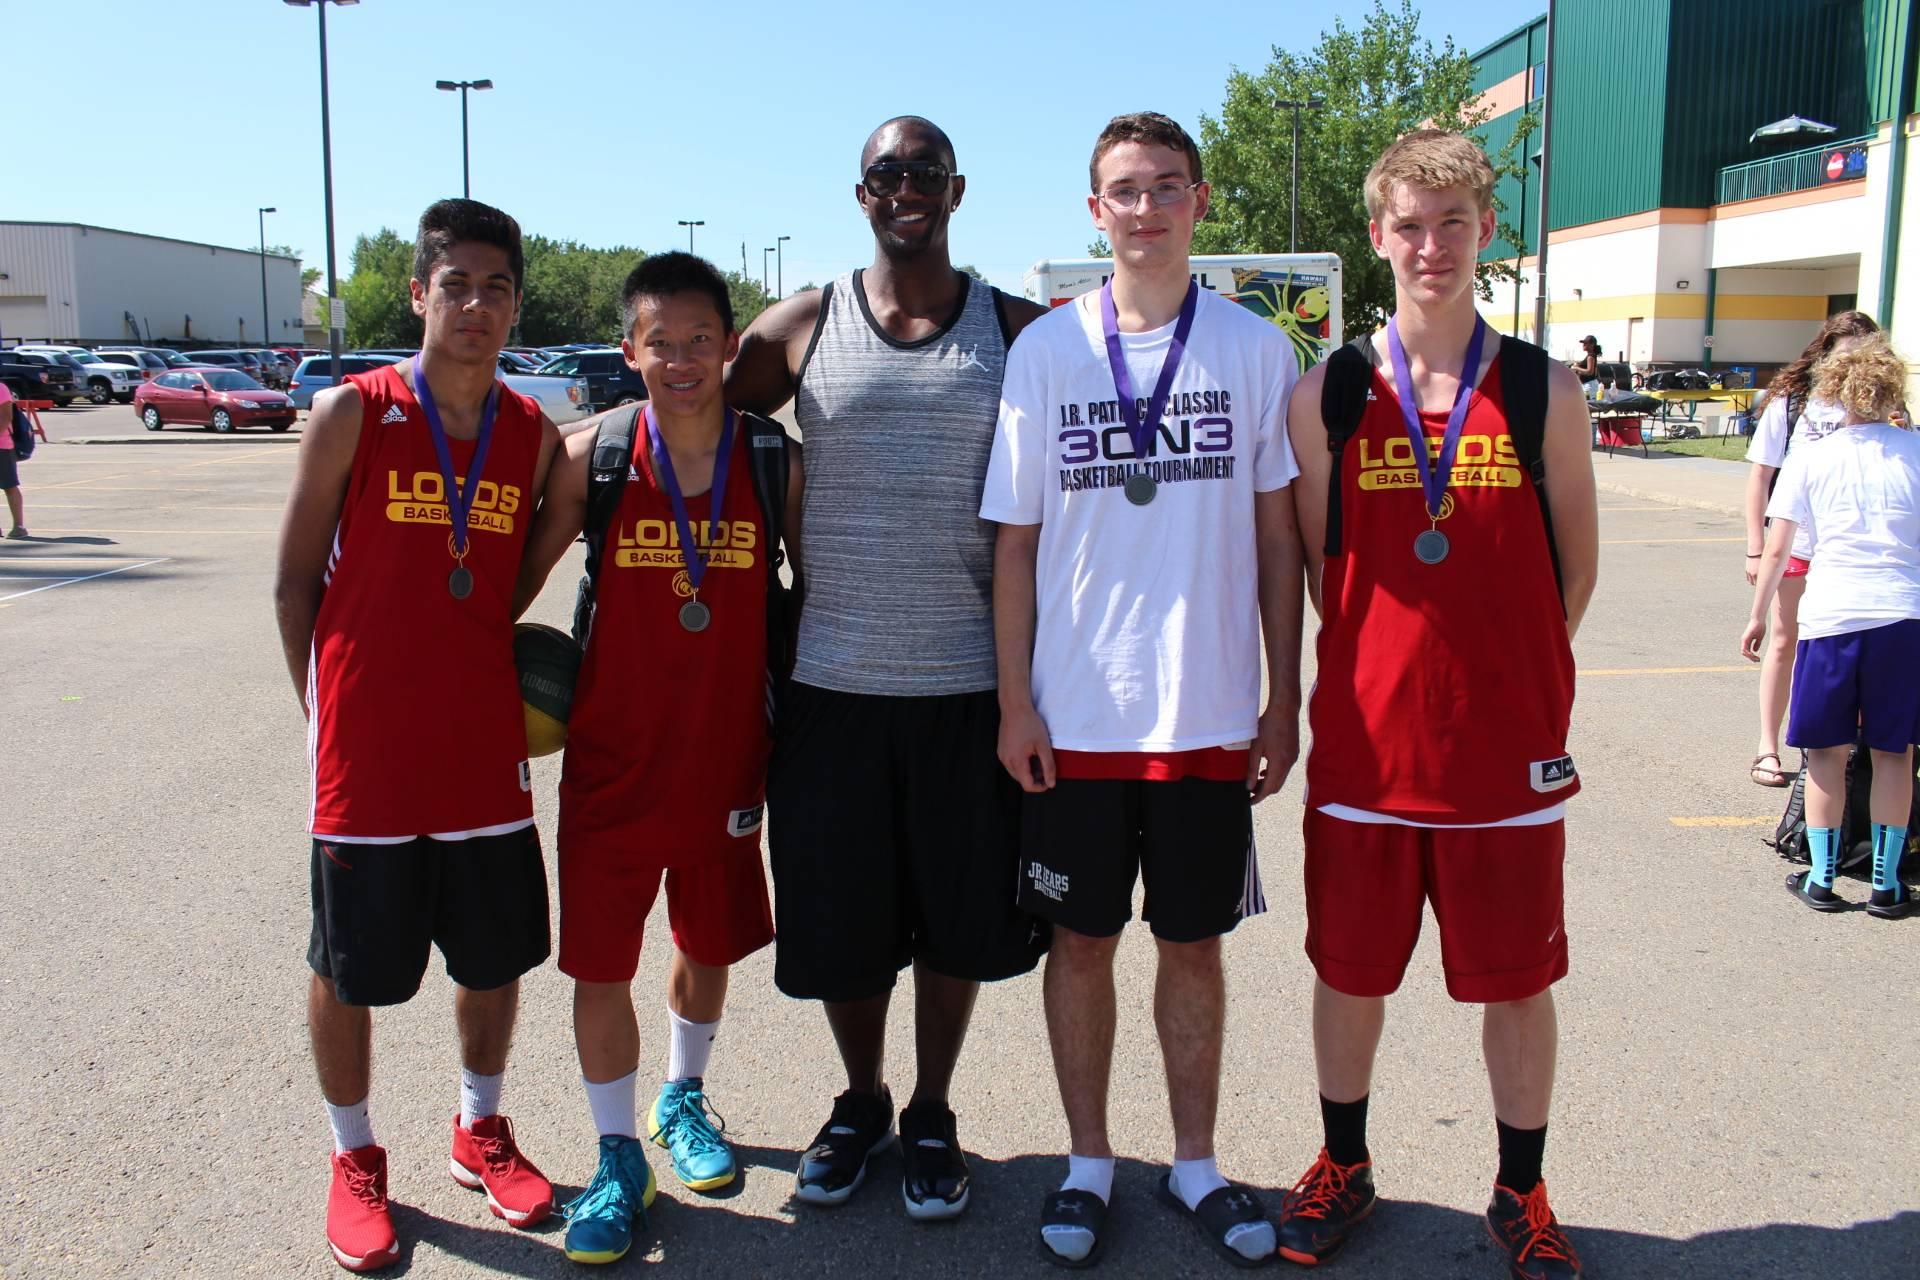 16-17yrs Old Boys Runner's Up Old: KDCS